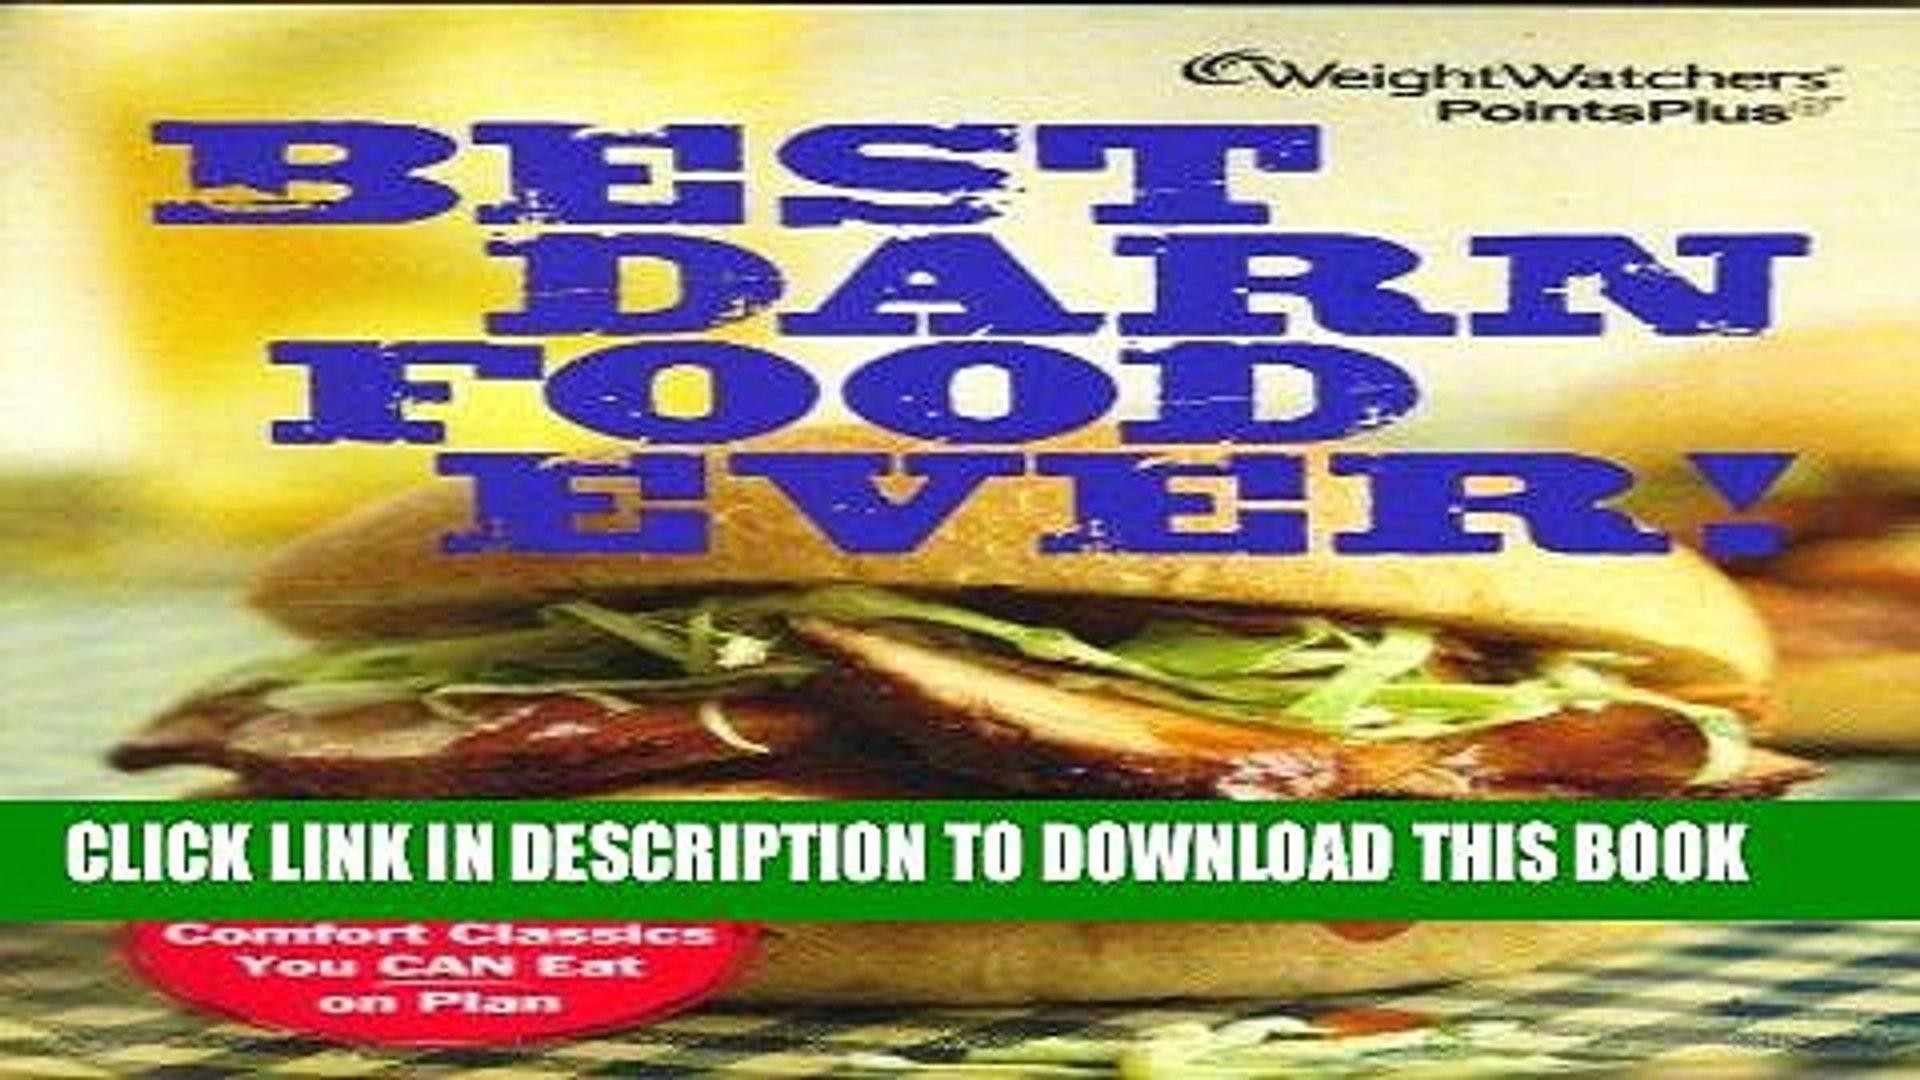 Best Seller Weight Watchers PointsPlus Best Darn Food Ever Cookbook (140 Comfort Classics) Free